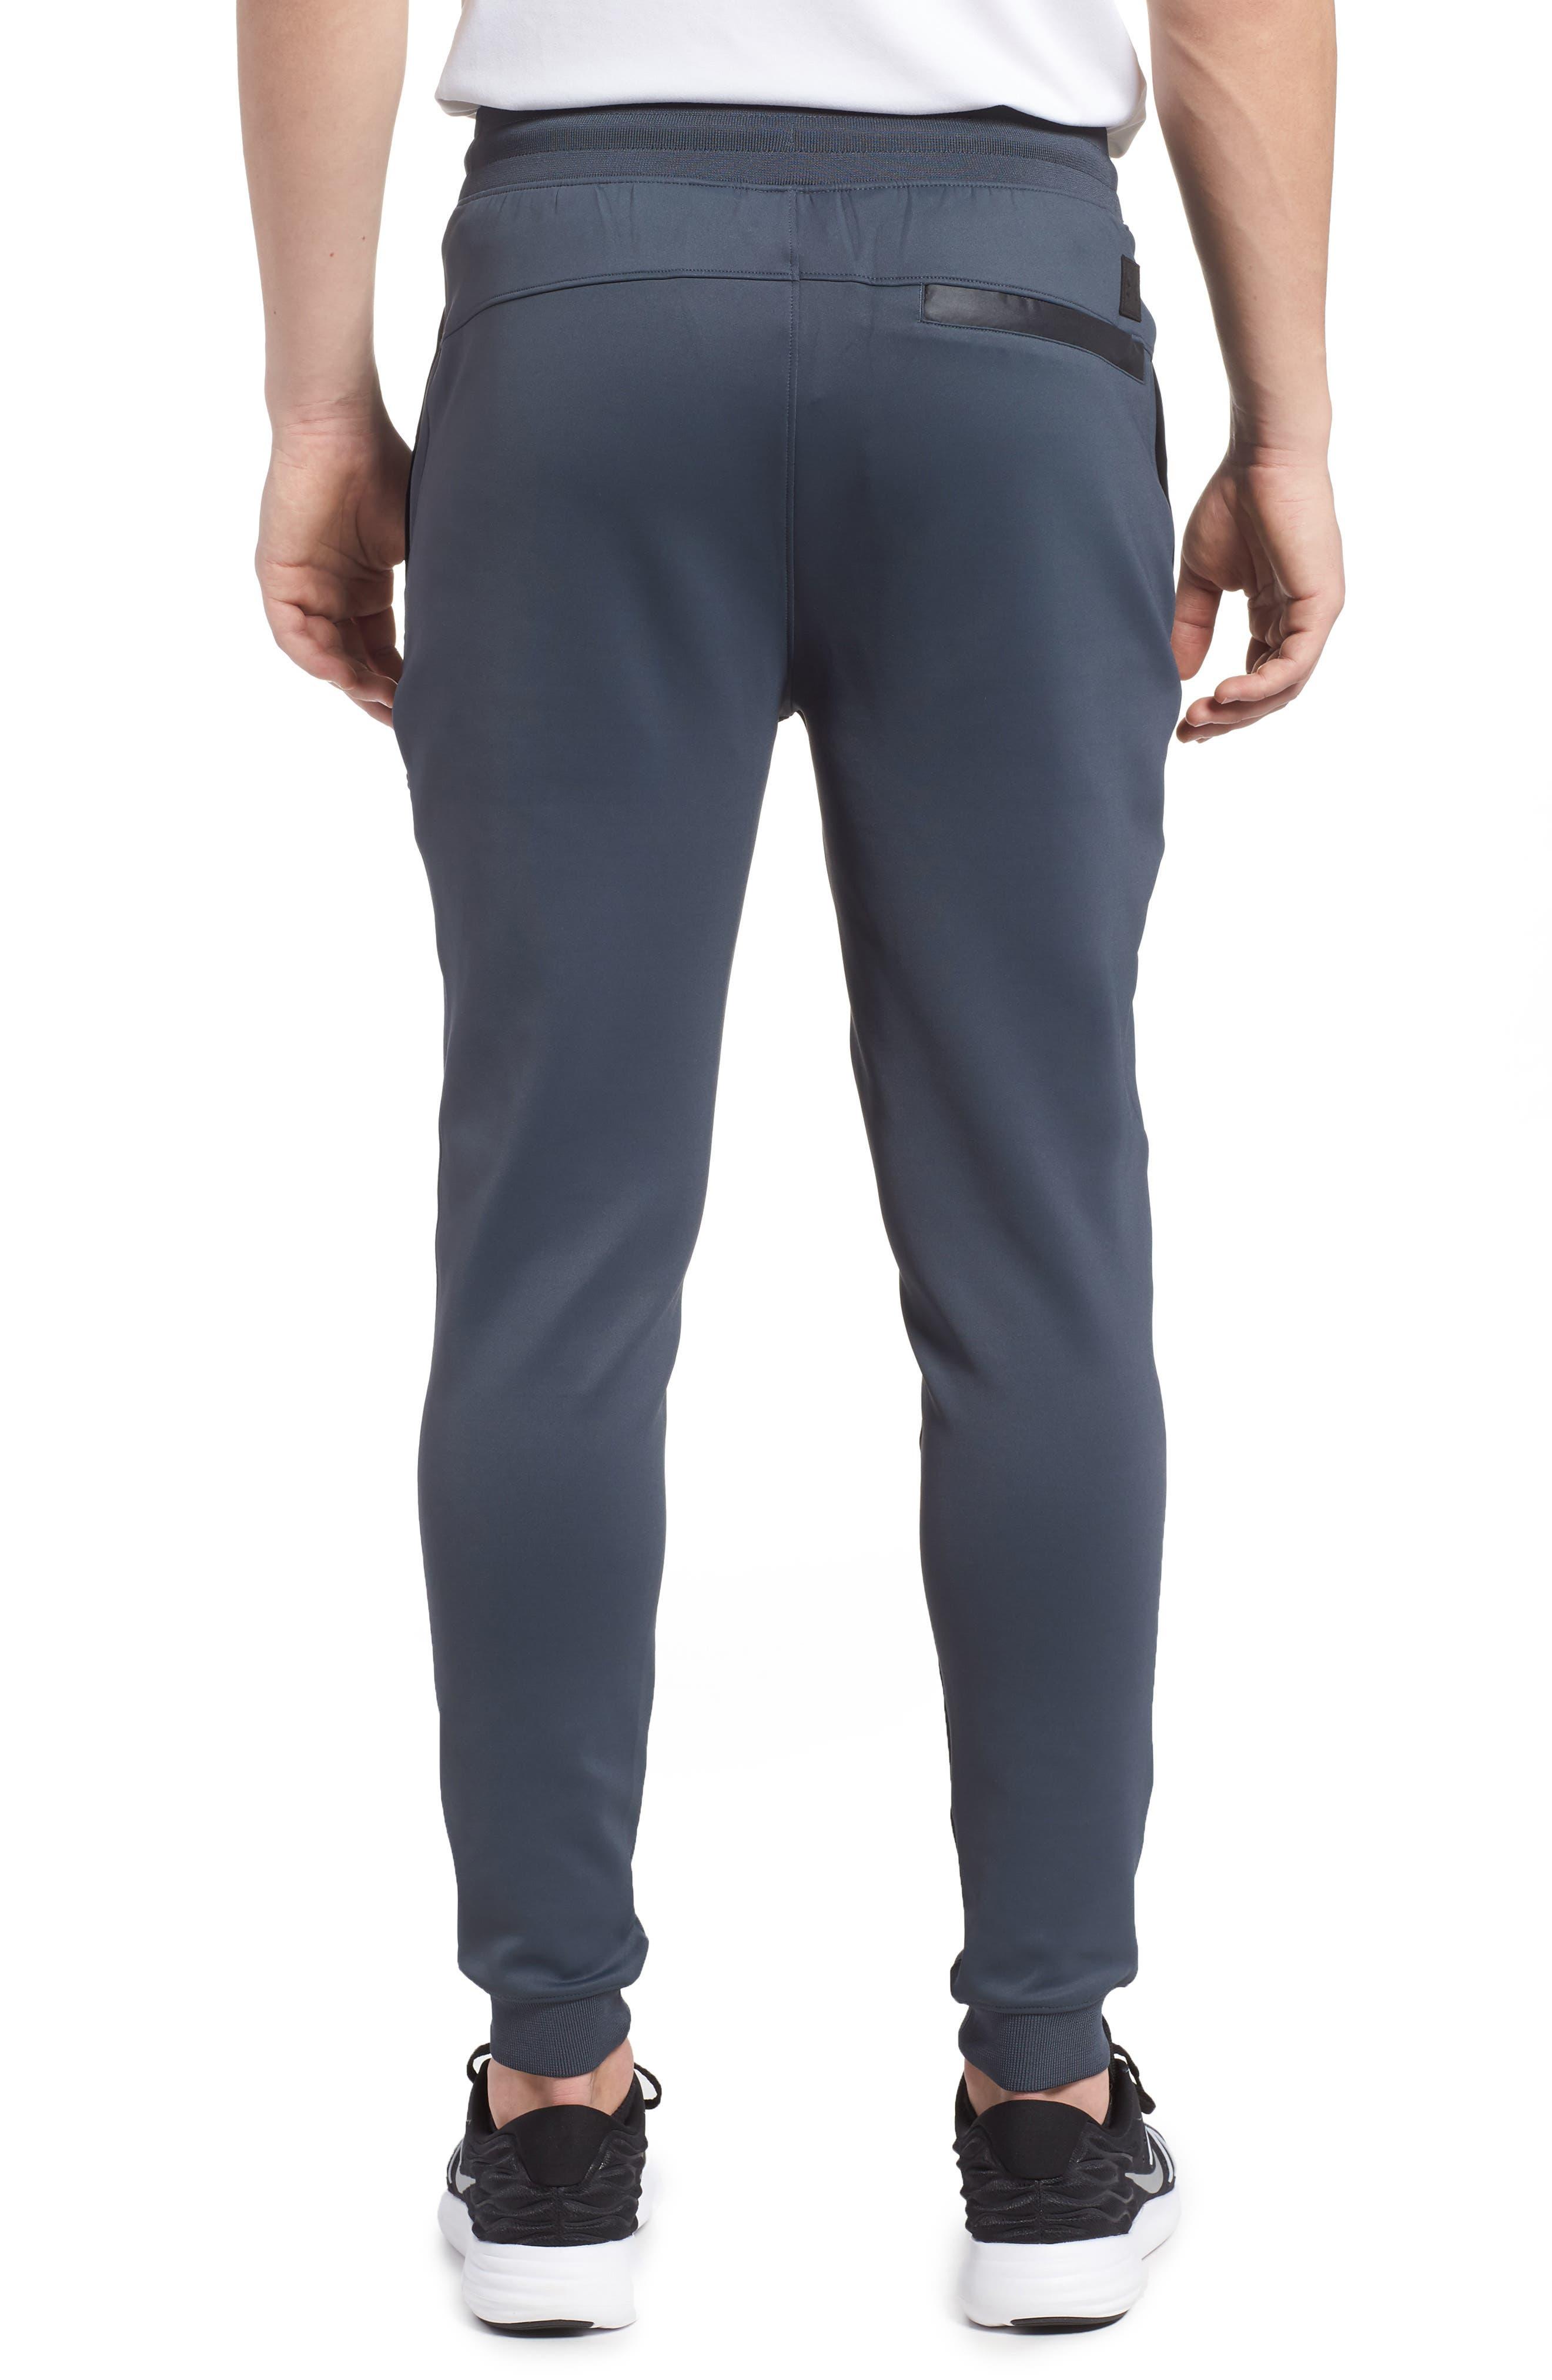 Utility Jogger Pants,                             Alternate thumbnail 2, color,                             Stealth Gray/ Black